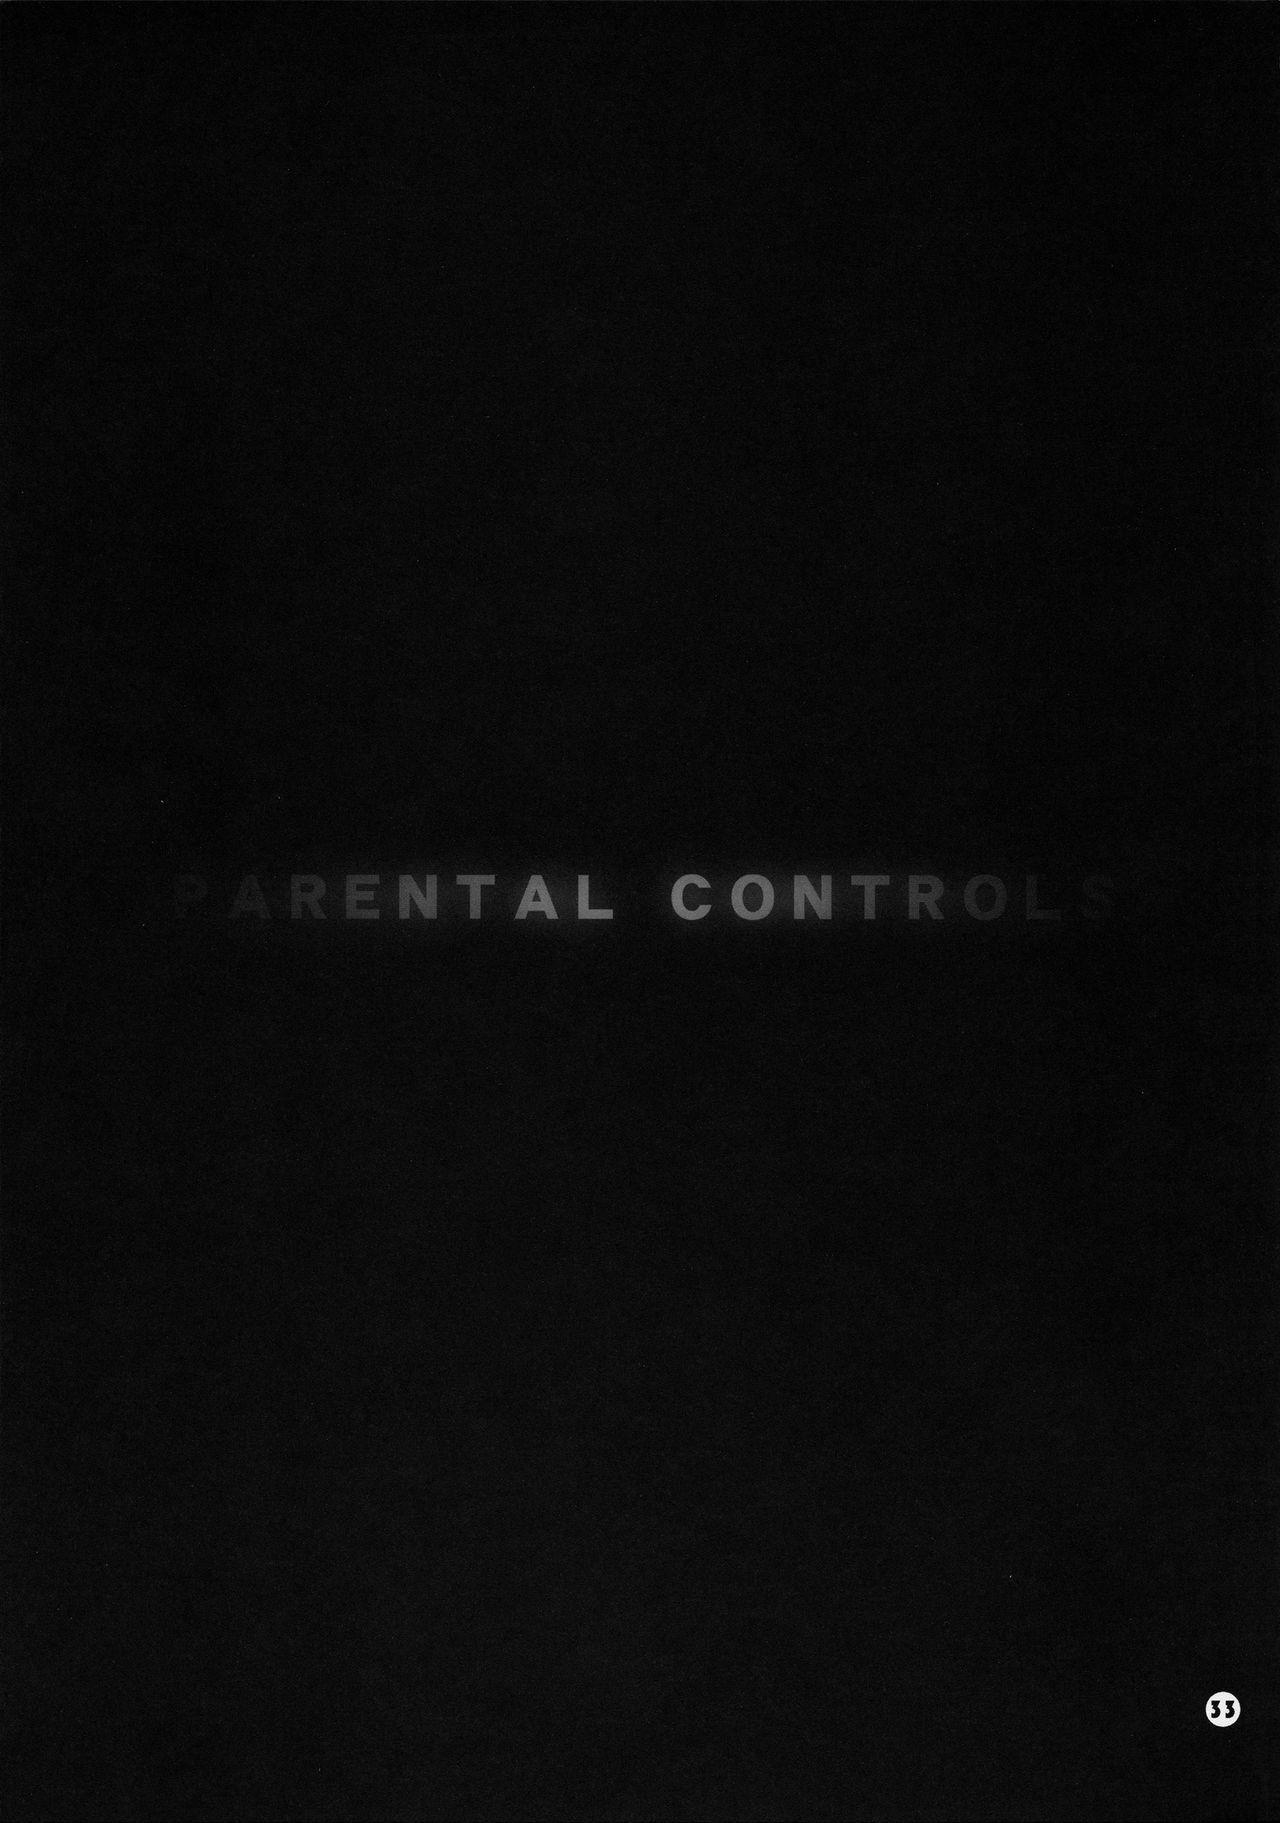 PARENTAL CONTROLS 31